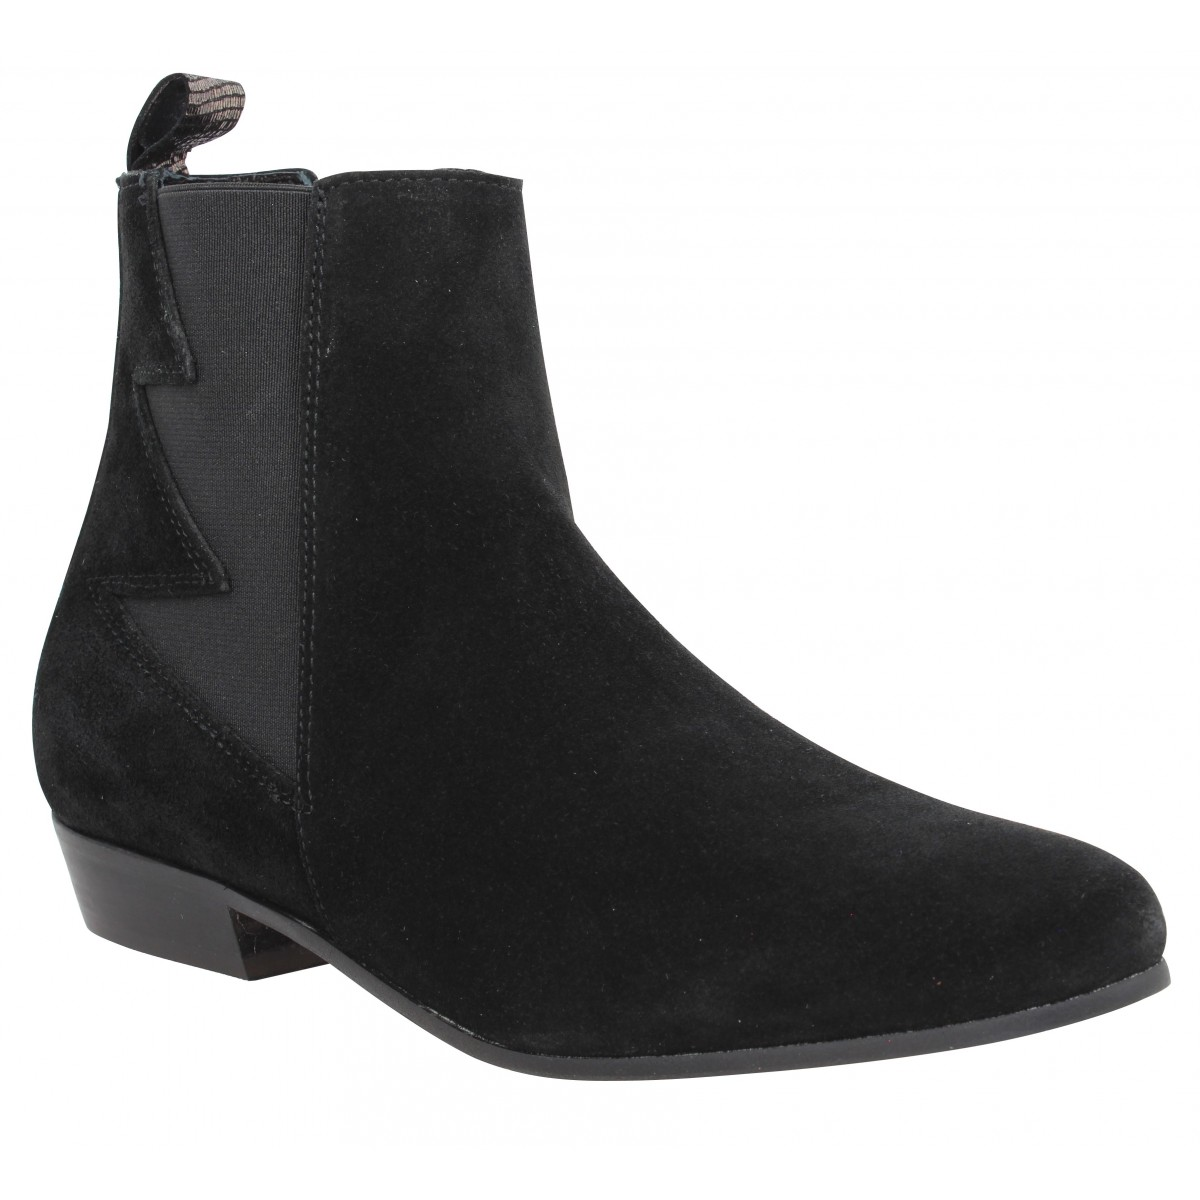 Bottines SCHMOOVE Peckham Boots velours Femme Noir